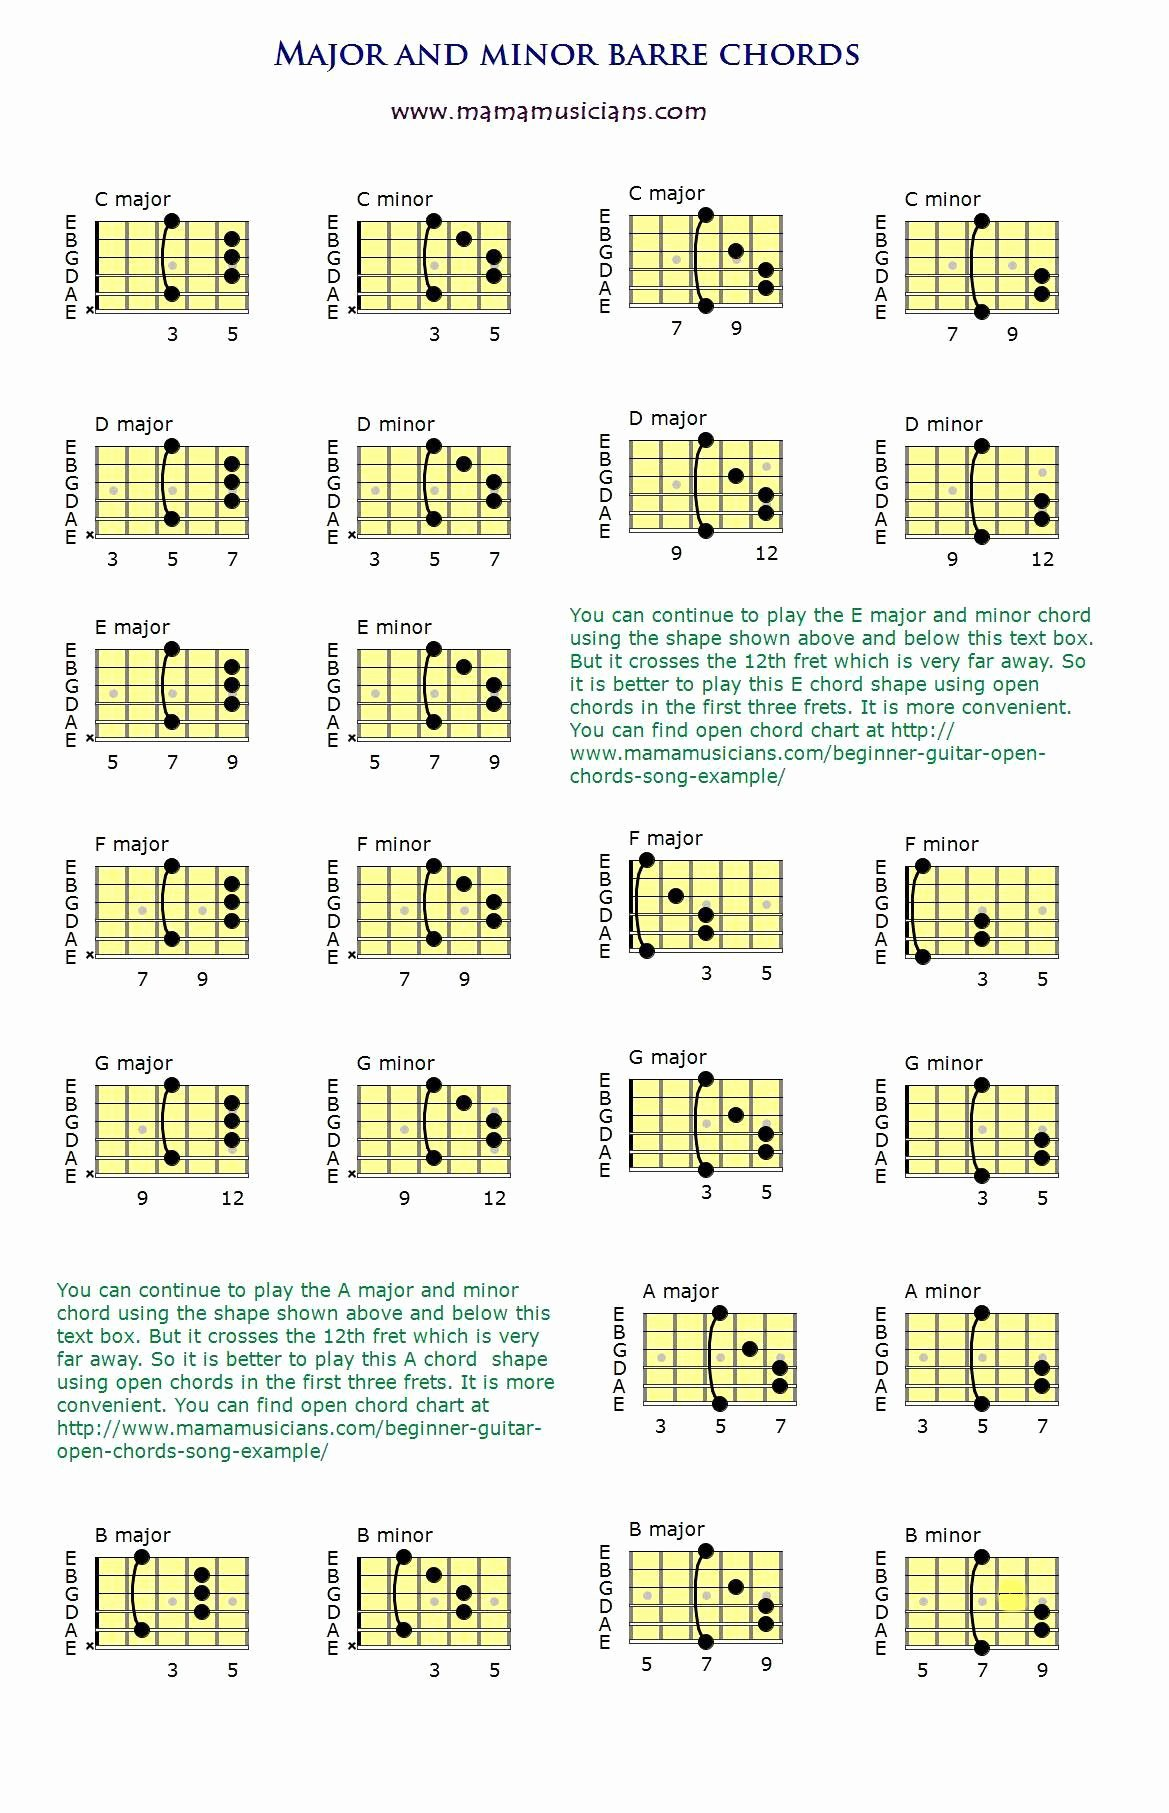 Bar Chords Guitar Chart Beautiful Barre Chords for Beginners Guitar Mamamusicians